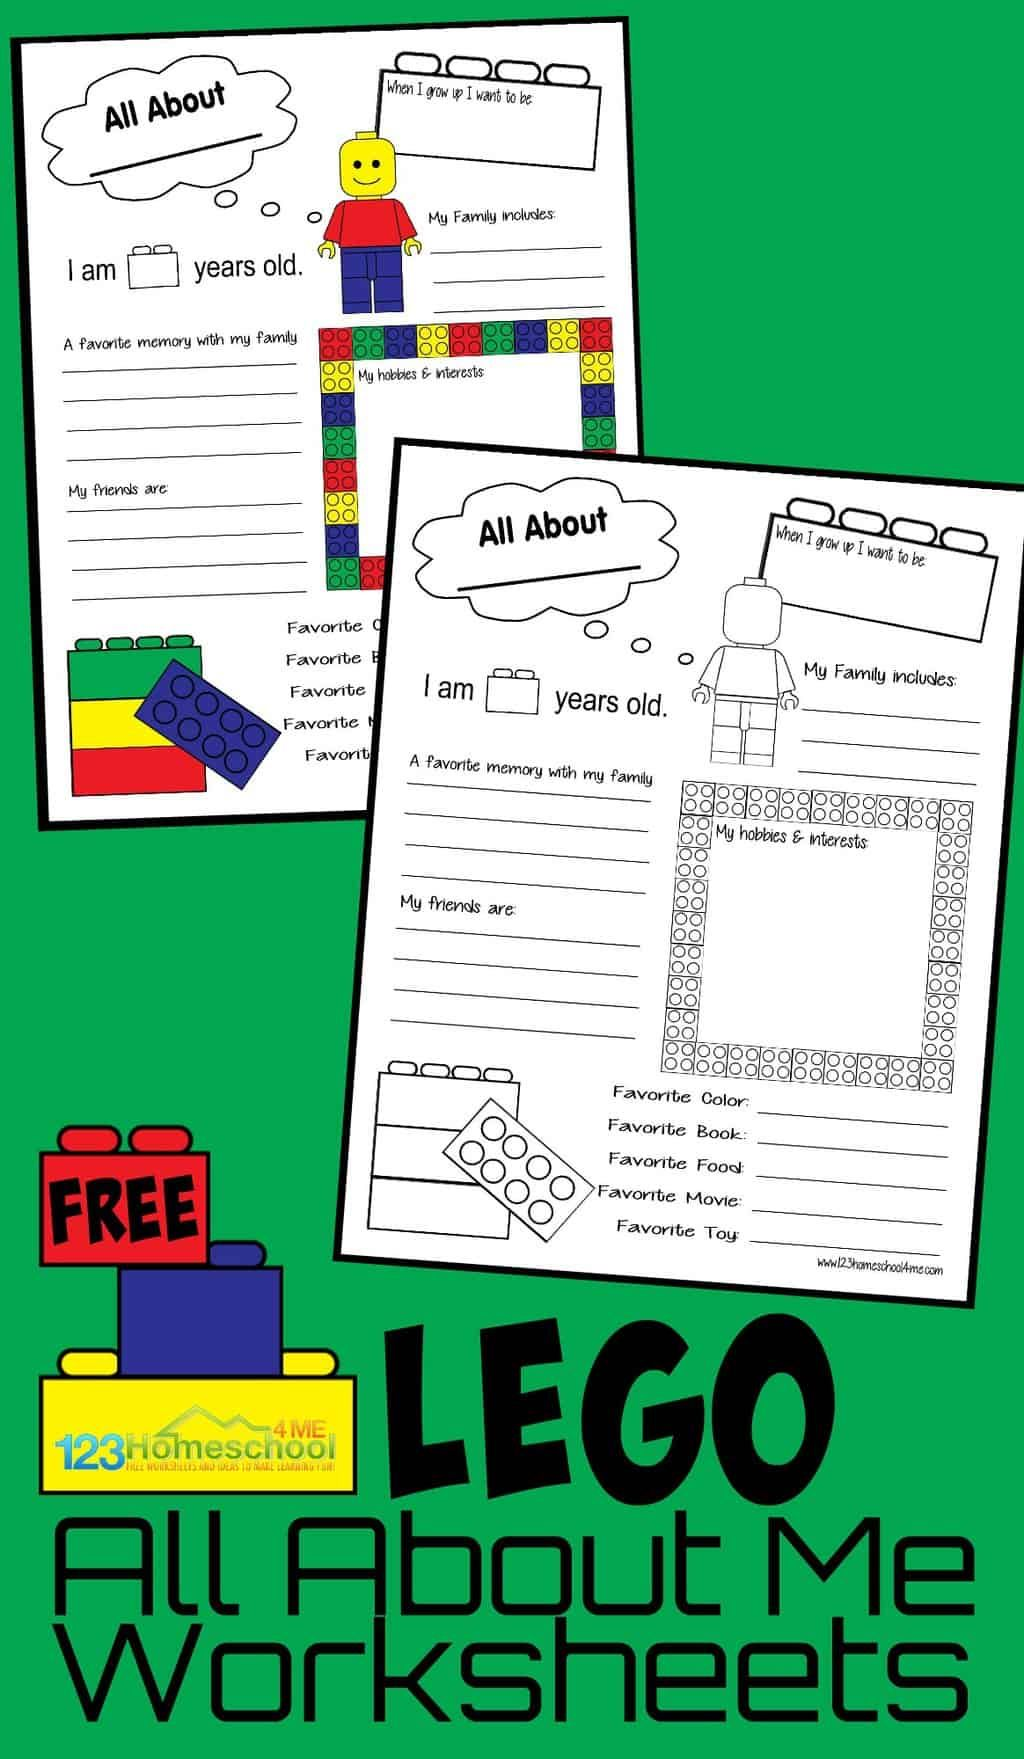 30++ Lego worksheets Free Download